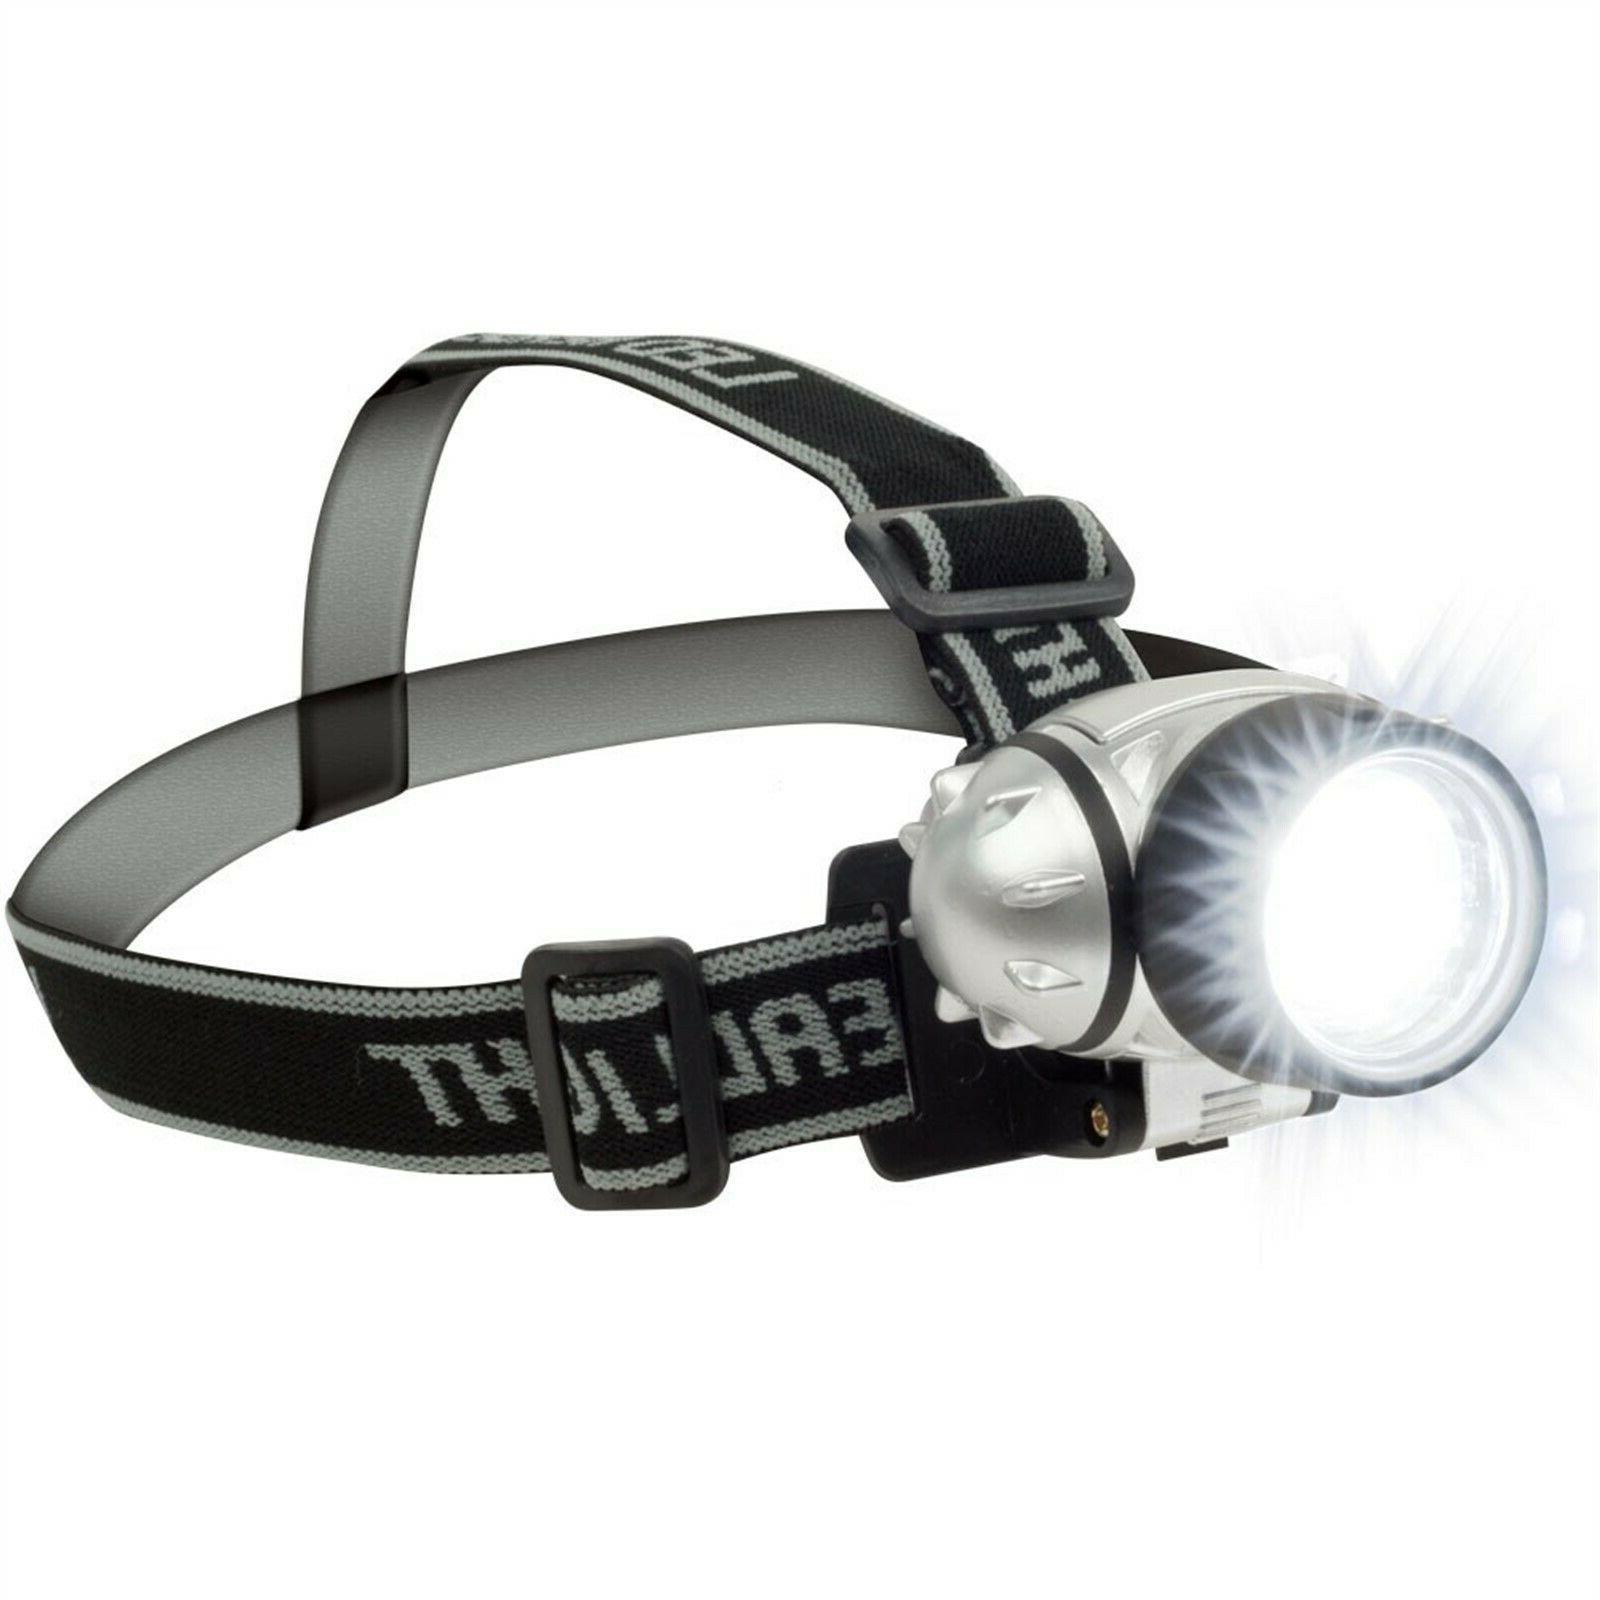 7 headlamp